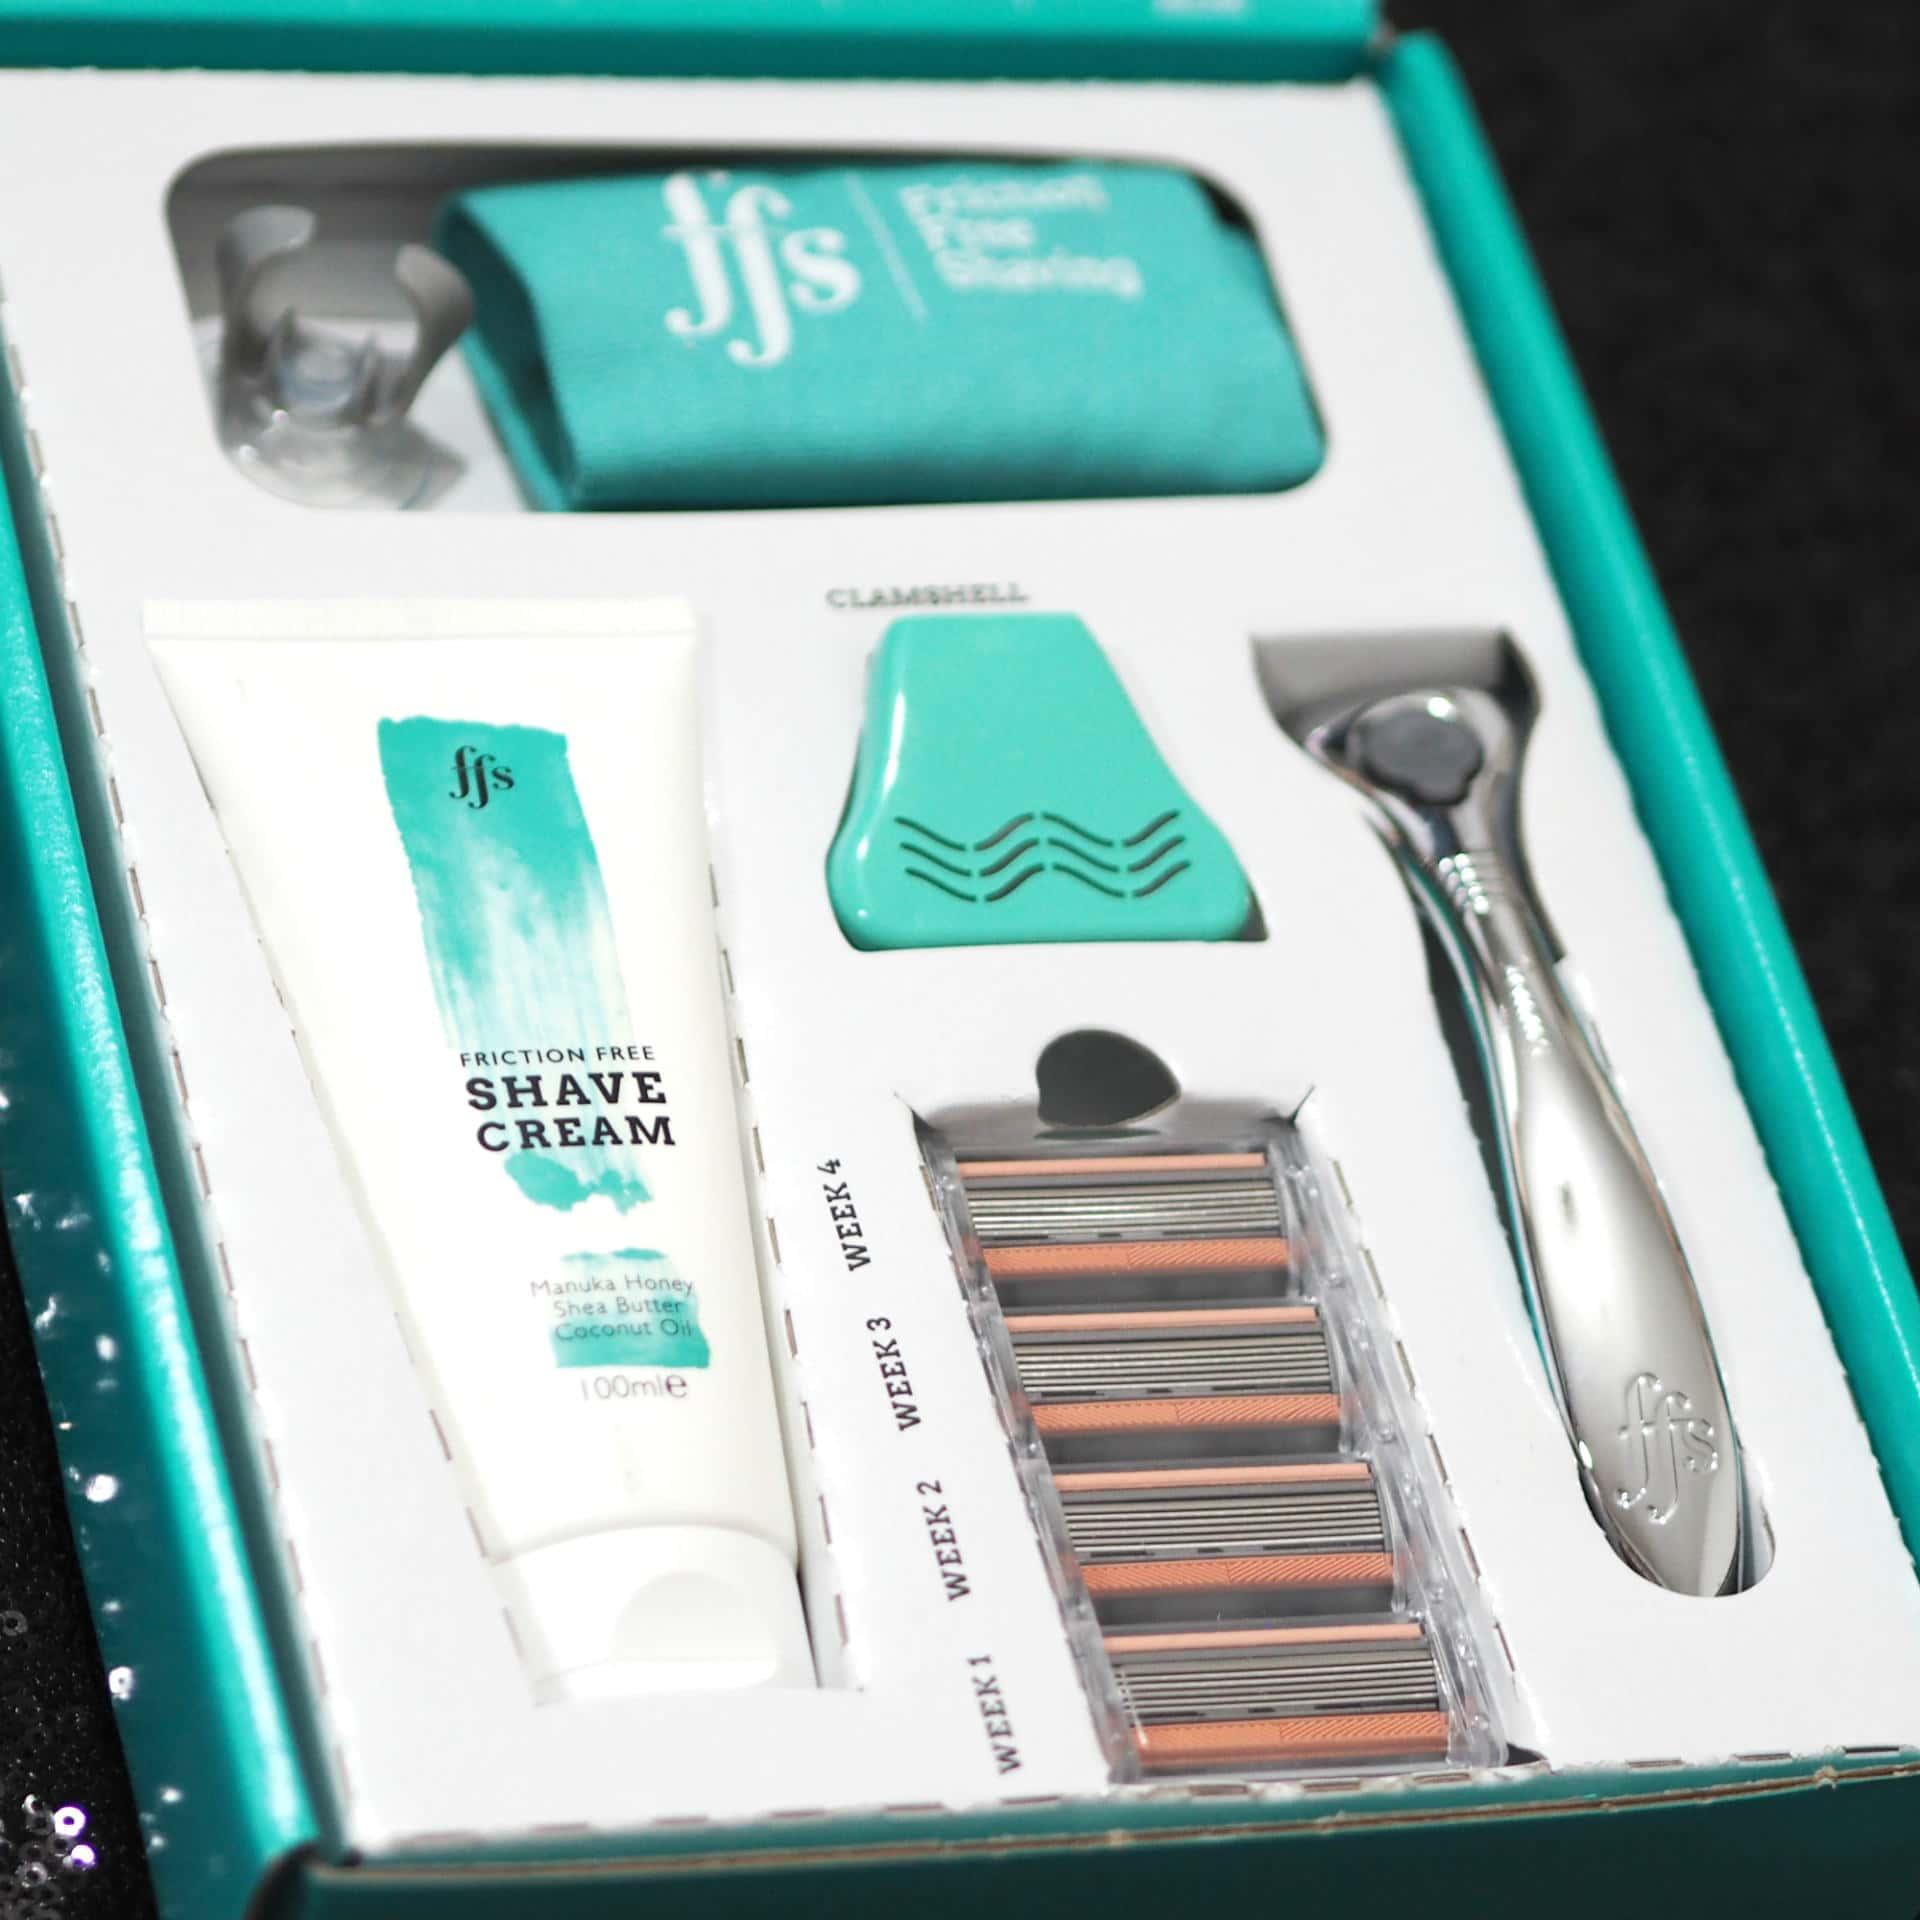 Friction Free Shaving Small Gift Set